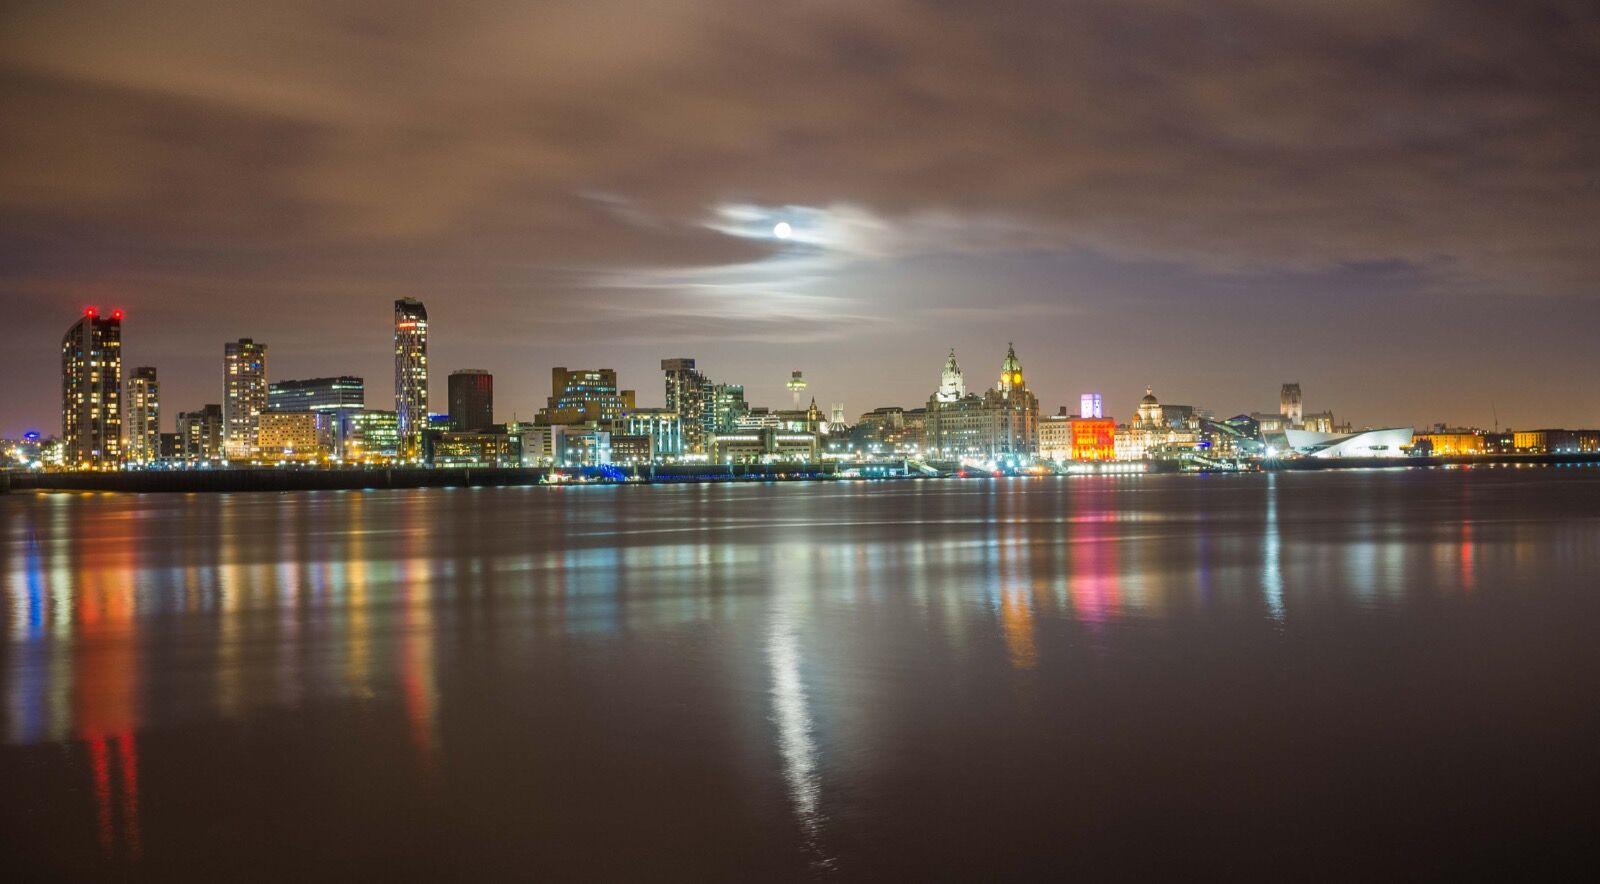 City of Liverpool Skyline